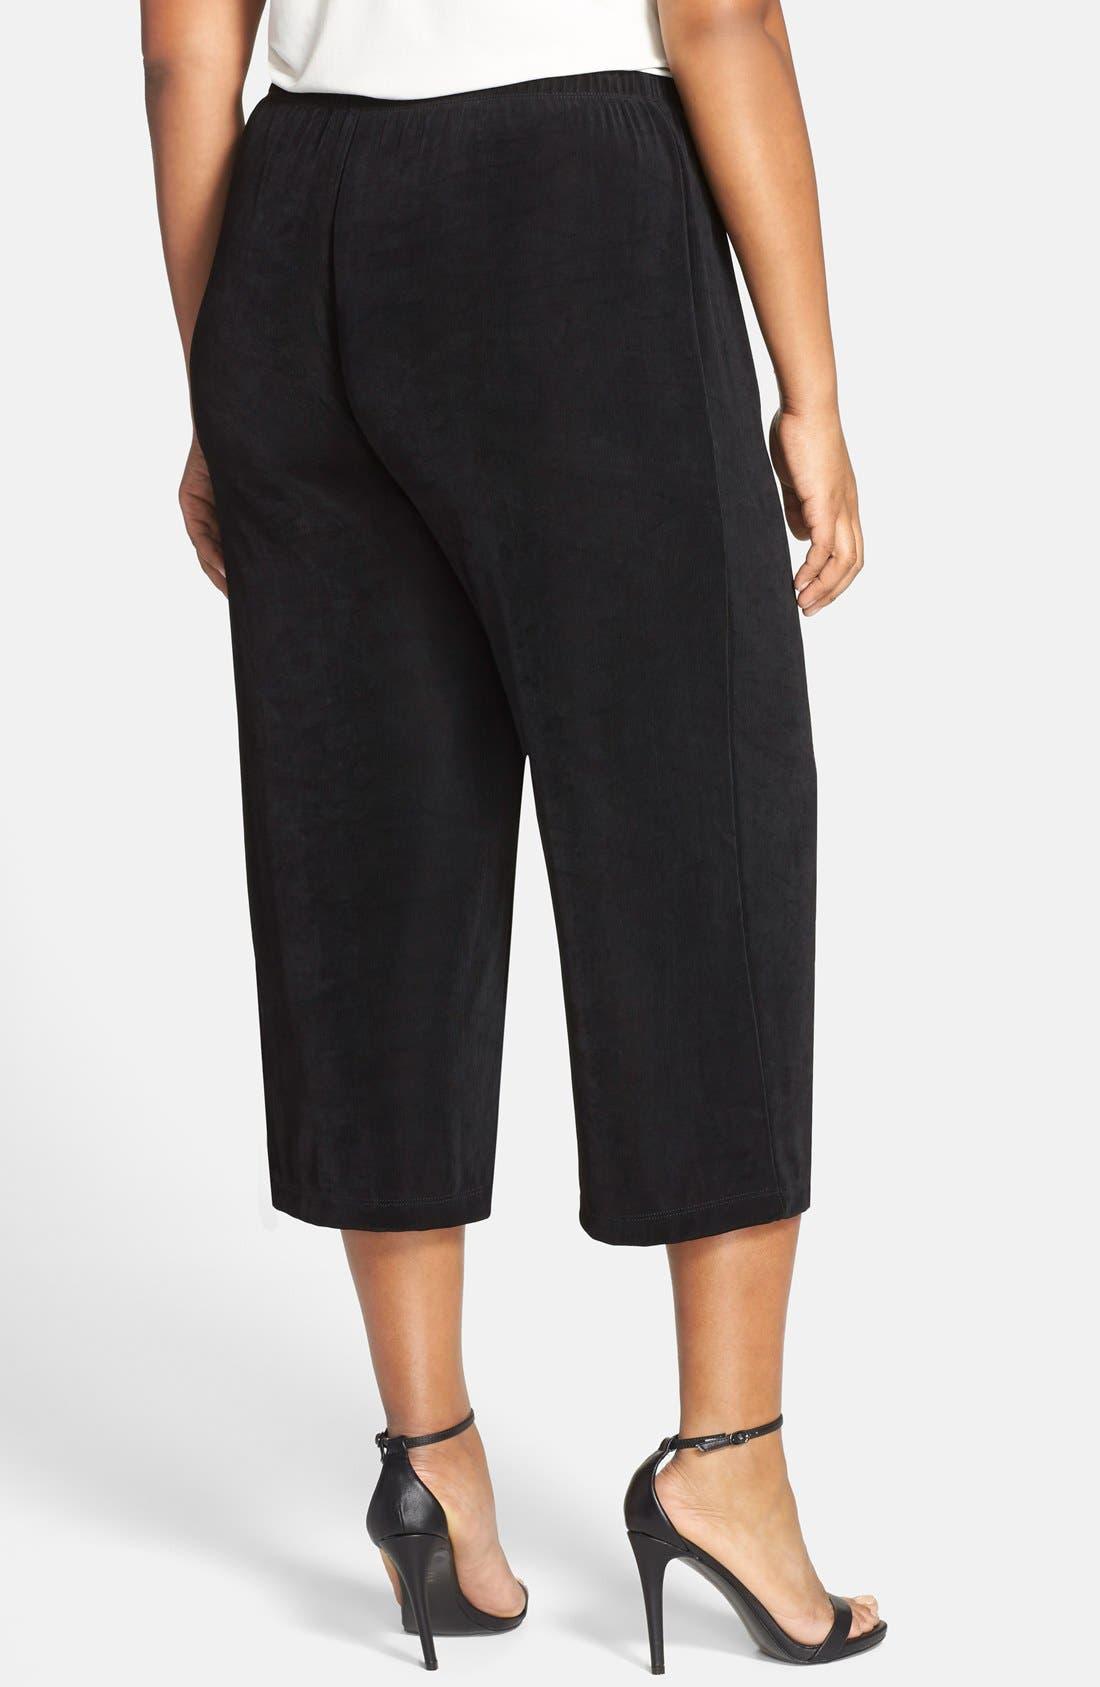 VIKKI VI, High Rise Stretch Knit Crop Pants, Alternate thumbnail 2, color, BLACK